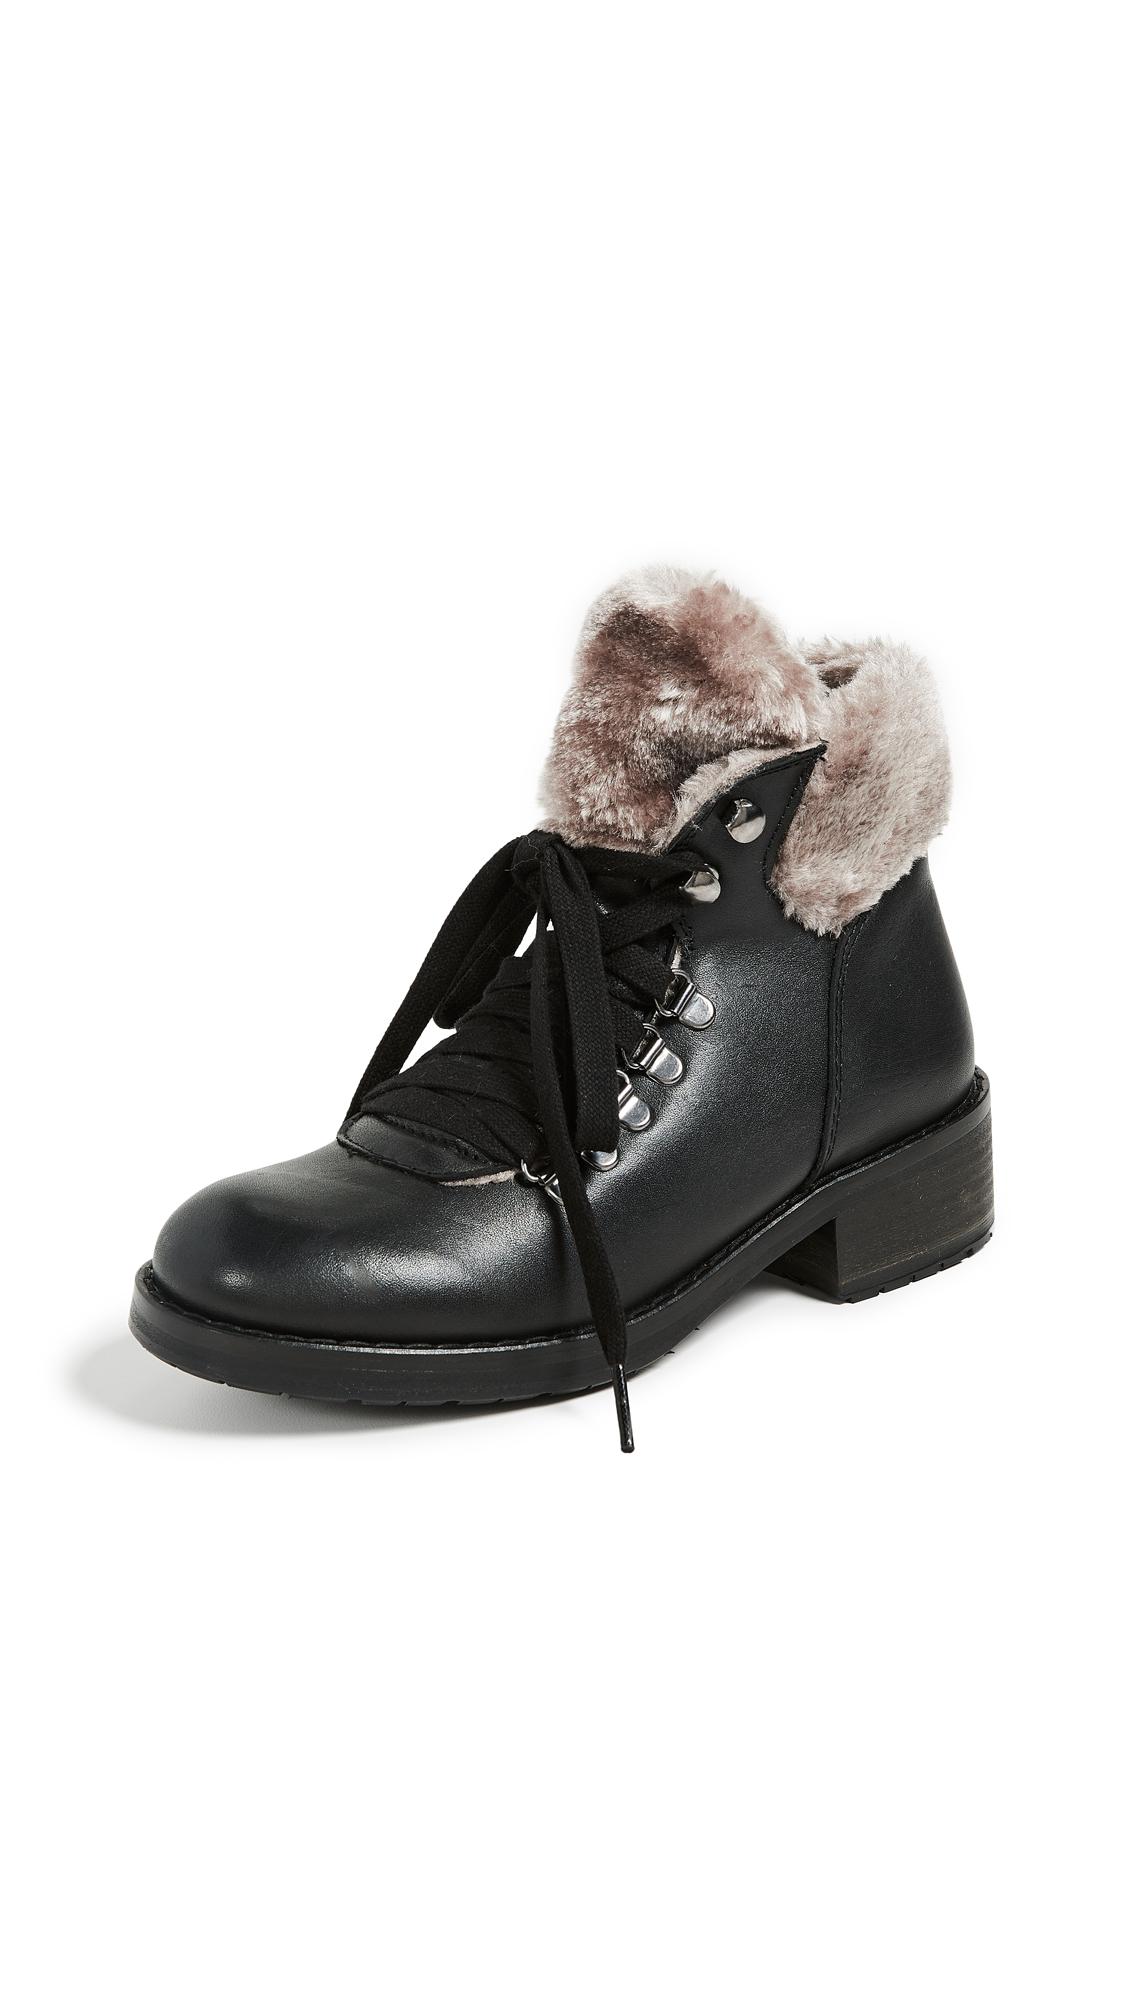 Steven Paloma Combat Boots - Black